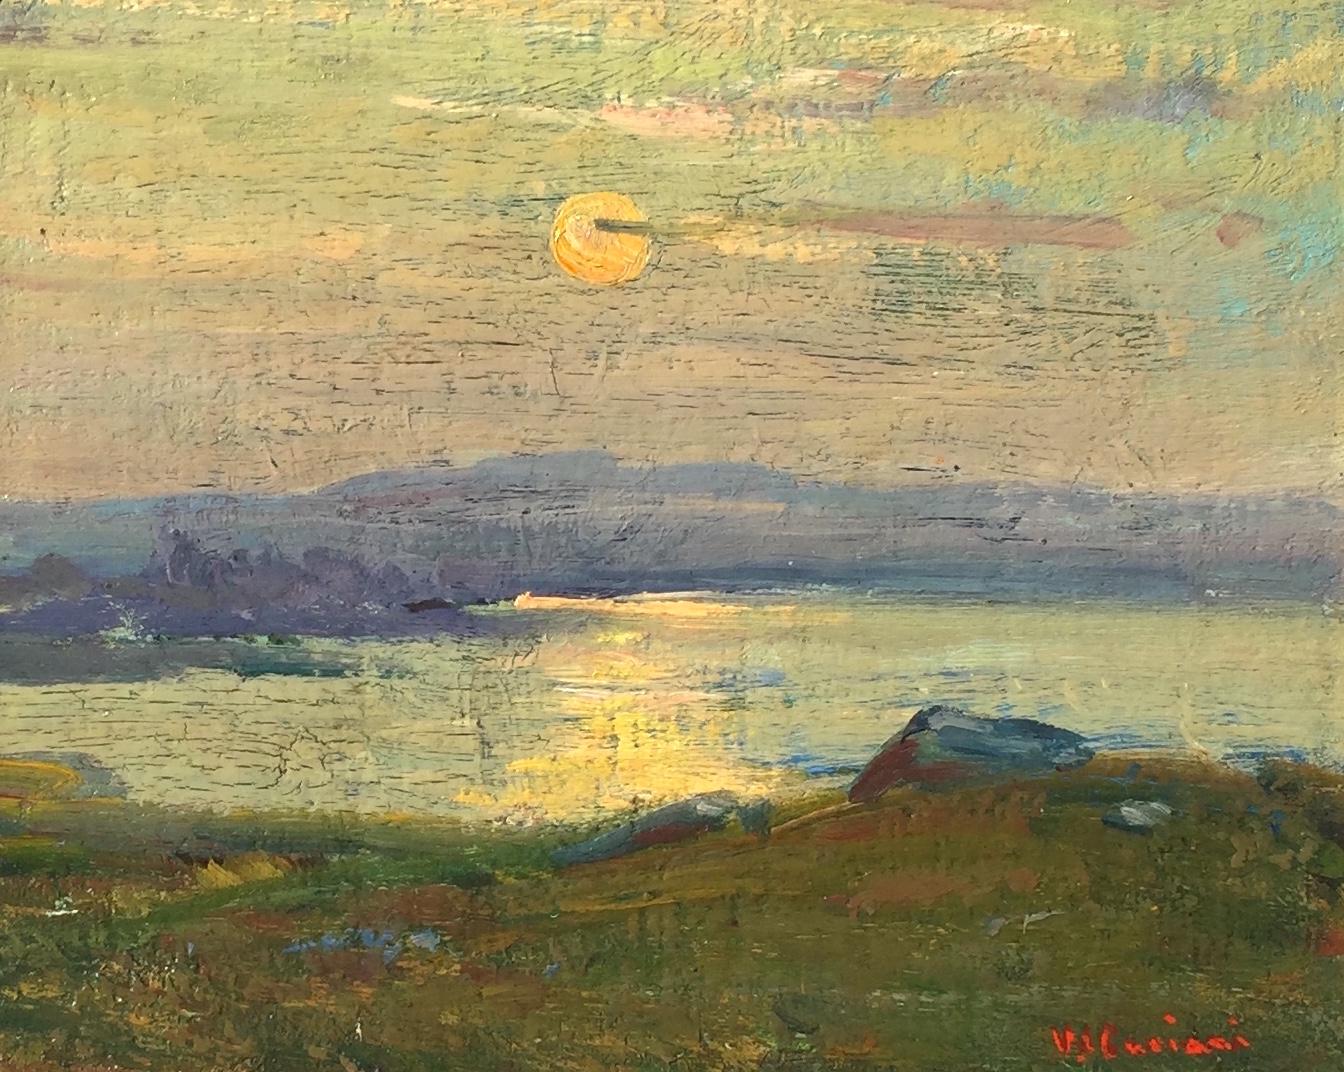 cariani-moonrise-cropped